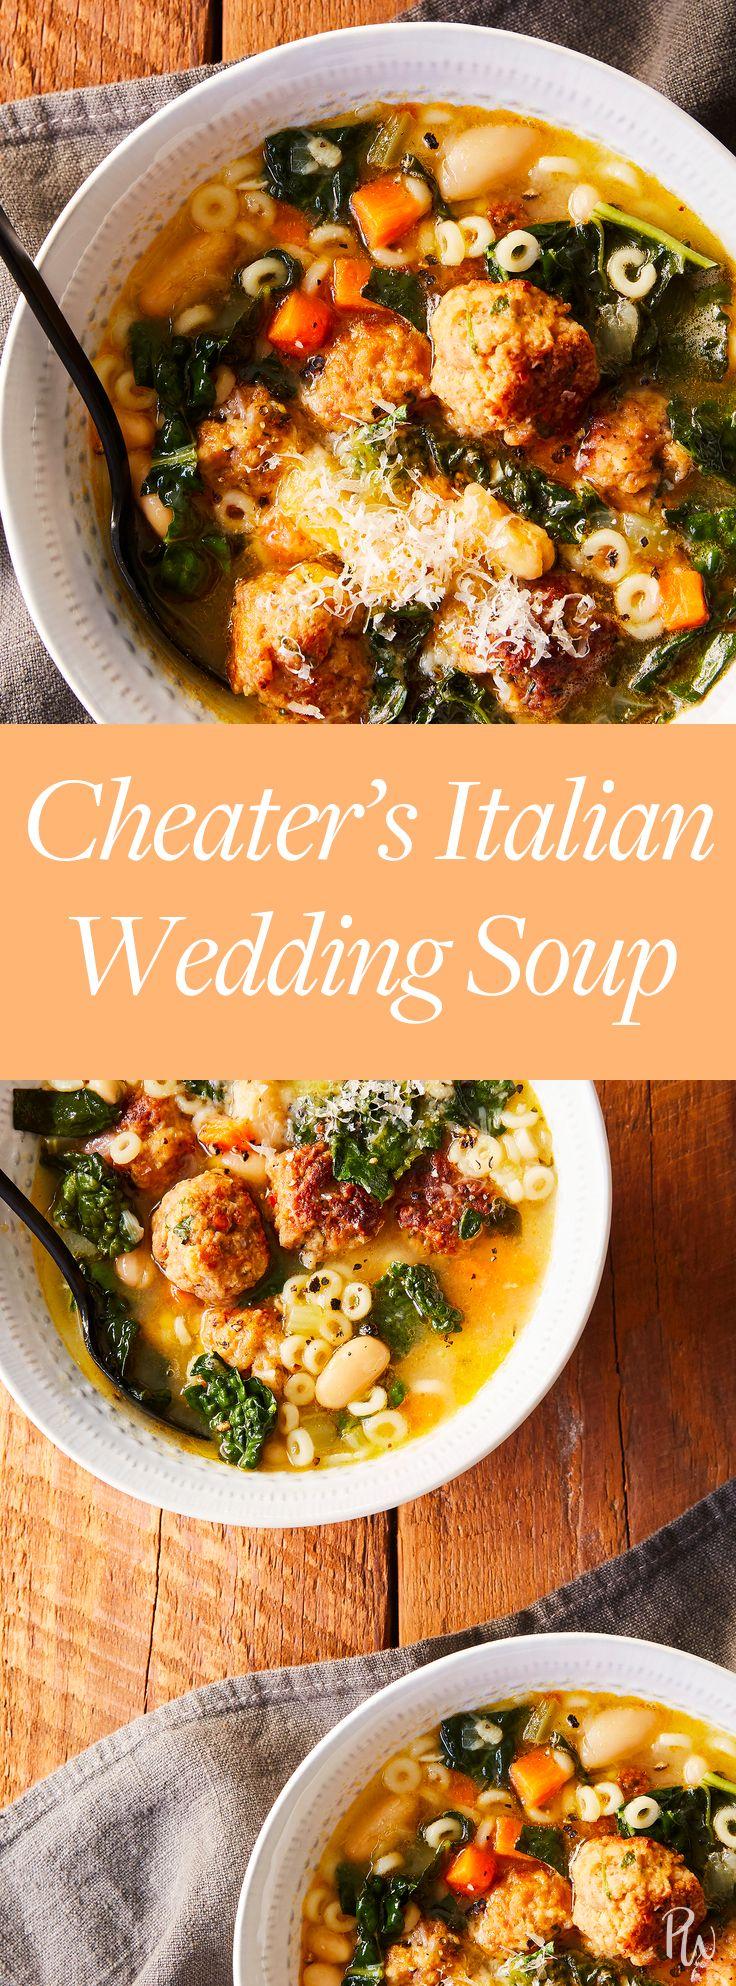 Cheater's Italian Wedding Soup Recipe Soups Wedding